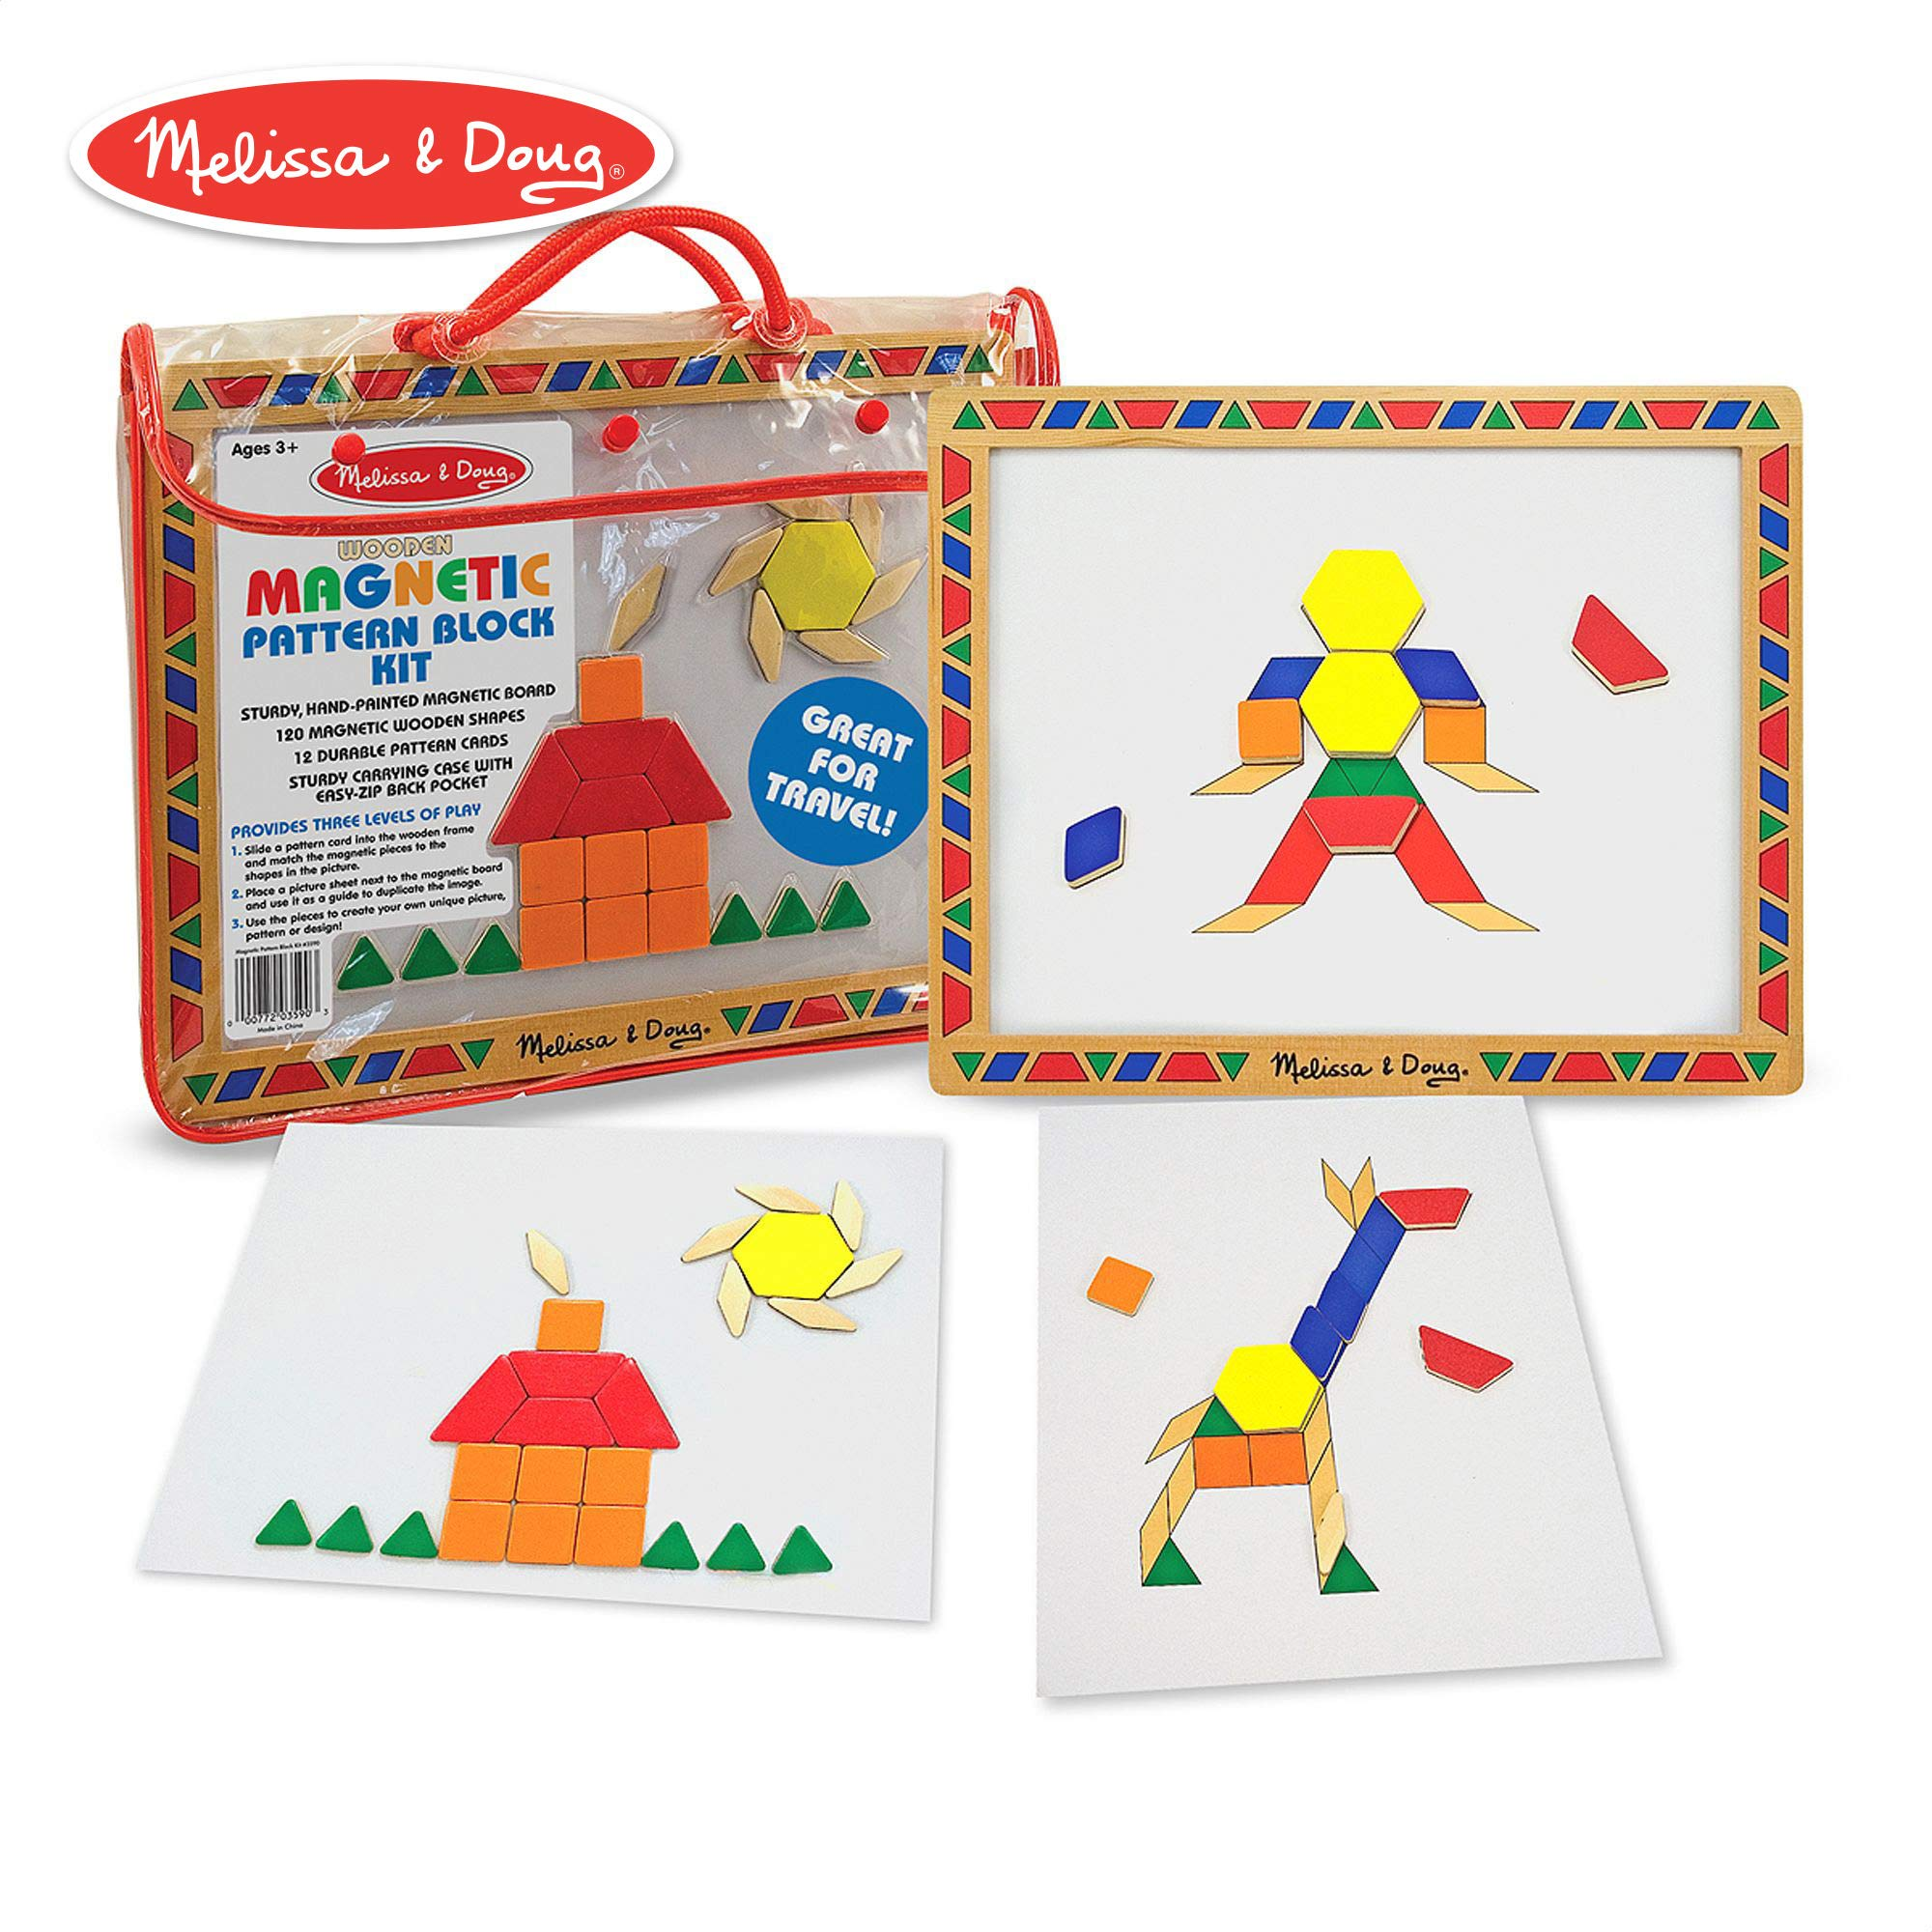 Melissa & Doug Magnetic Pattern Blocks Set, Developmental Toys, Sturdy Wooden Play Board, Carrying Case, 120 Pieces, 14.5'' H x 12.5'' W x 1.5'' L